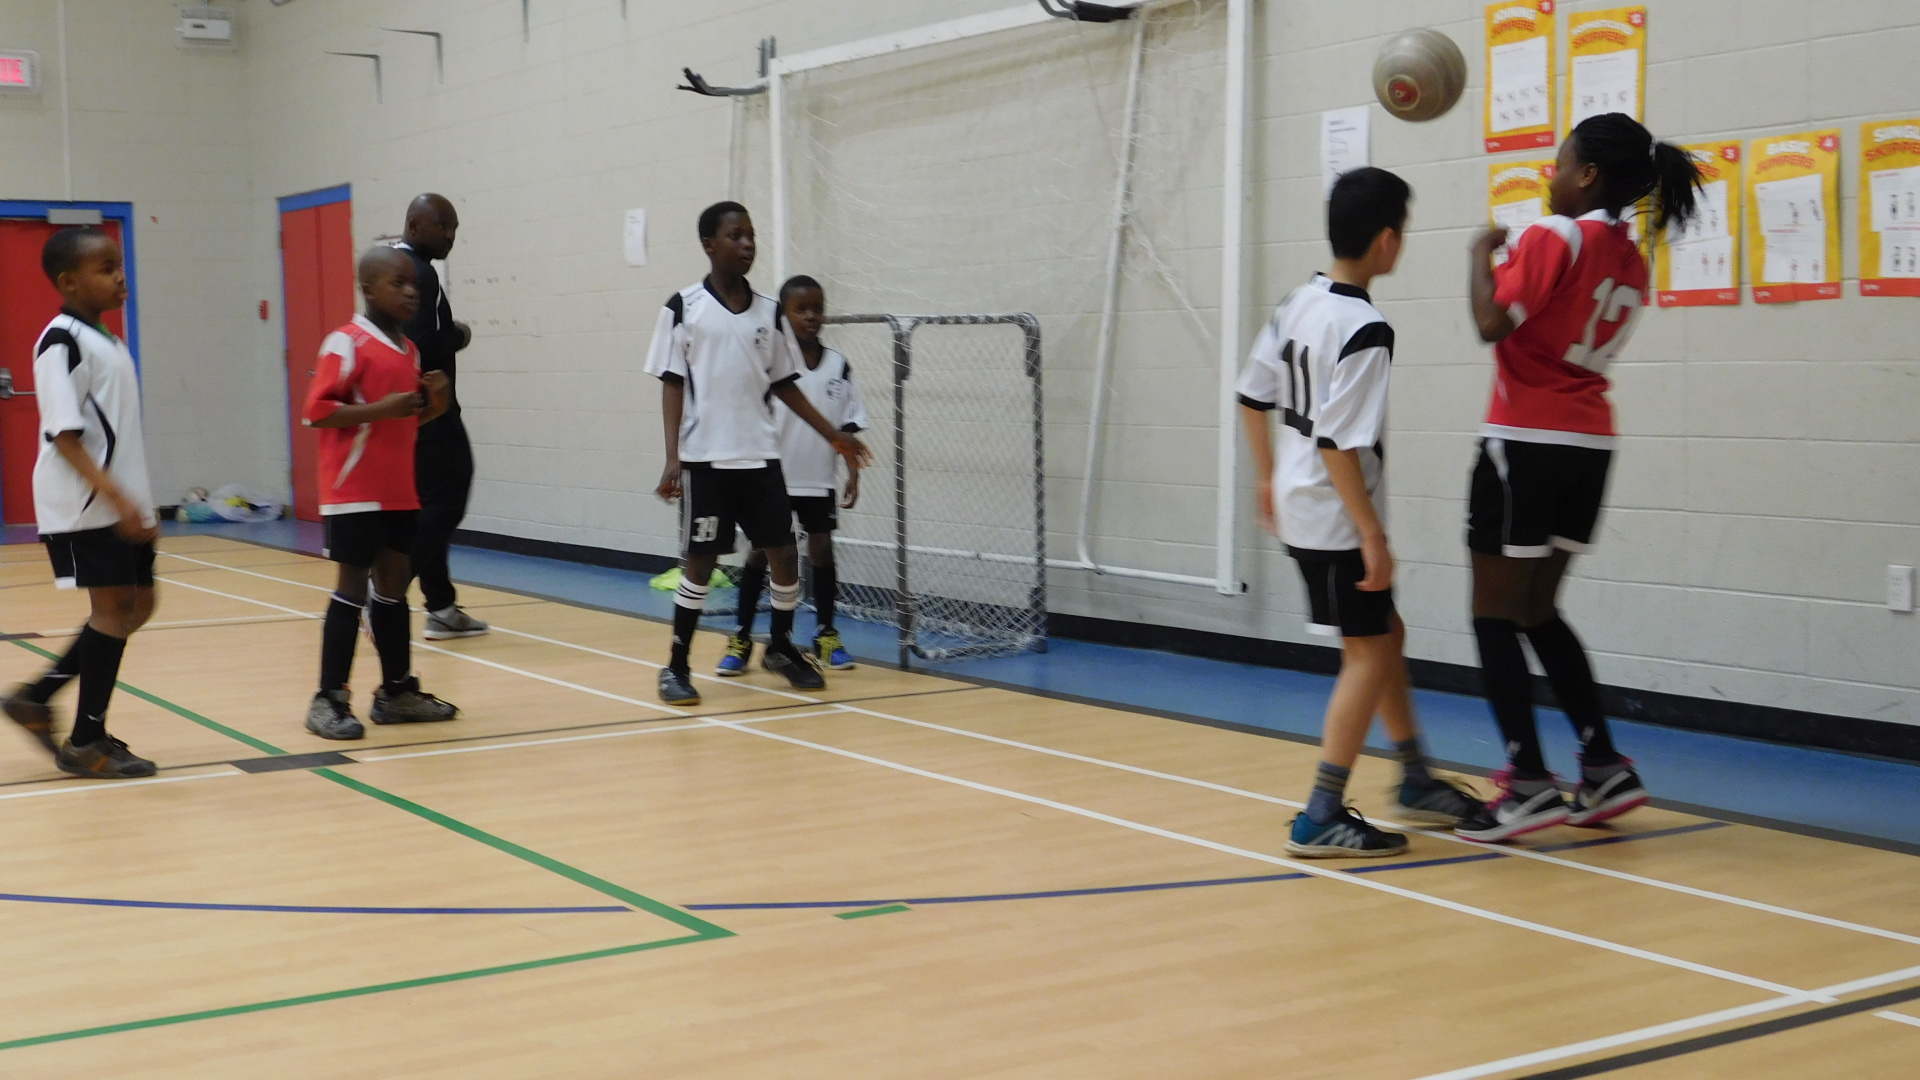 Soccer Practice: Child